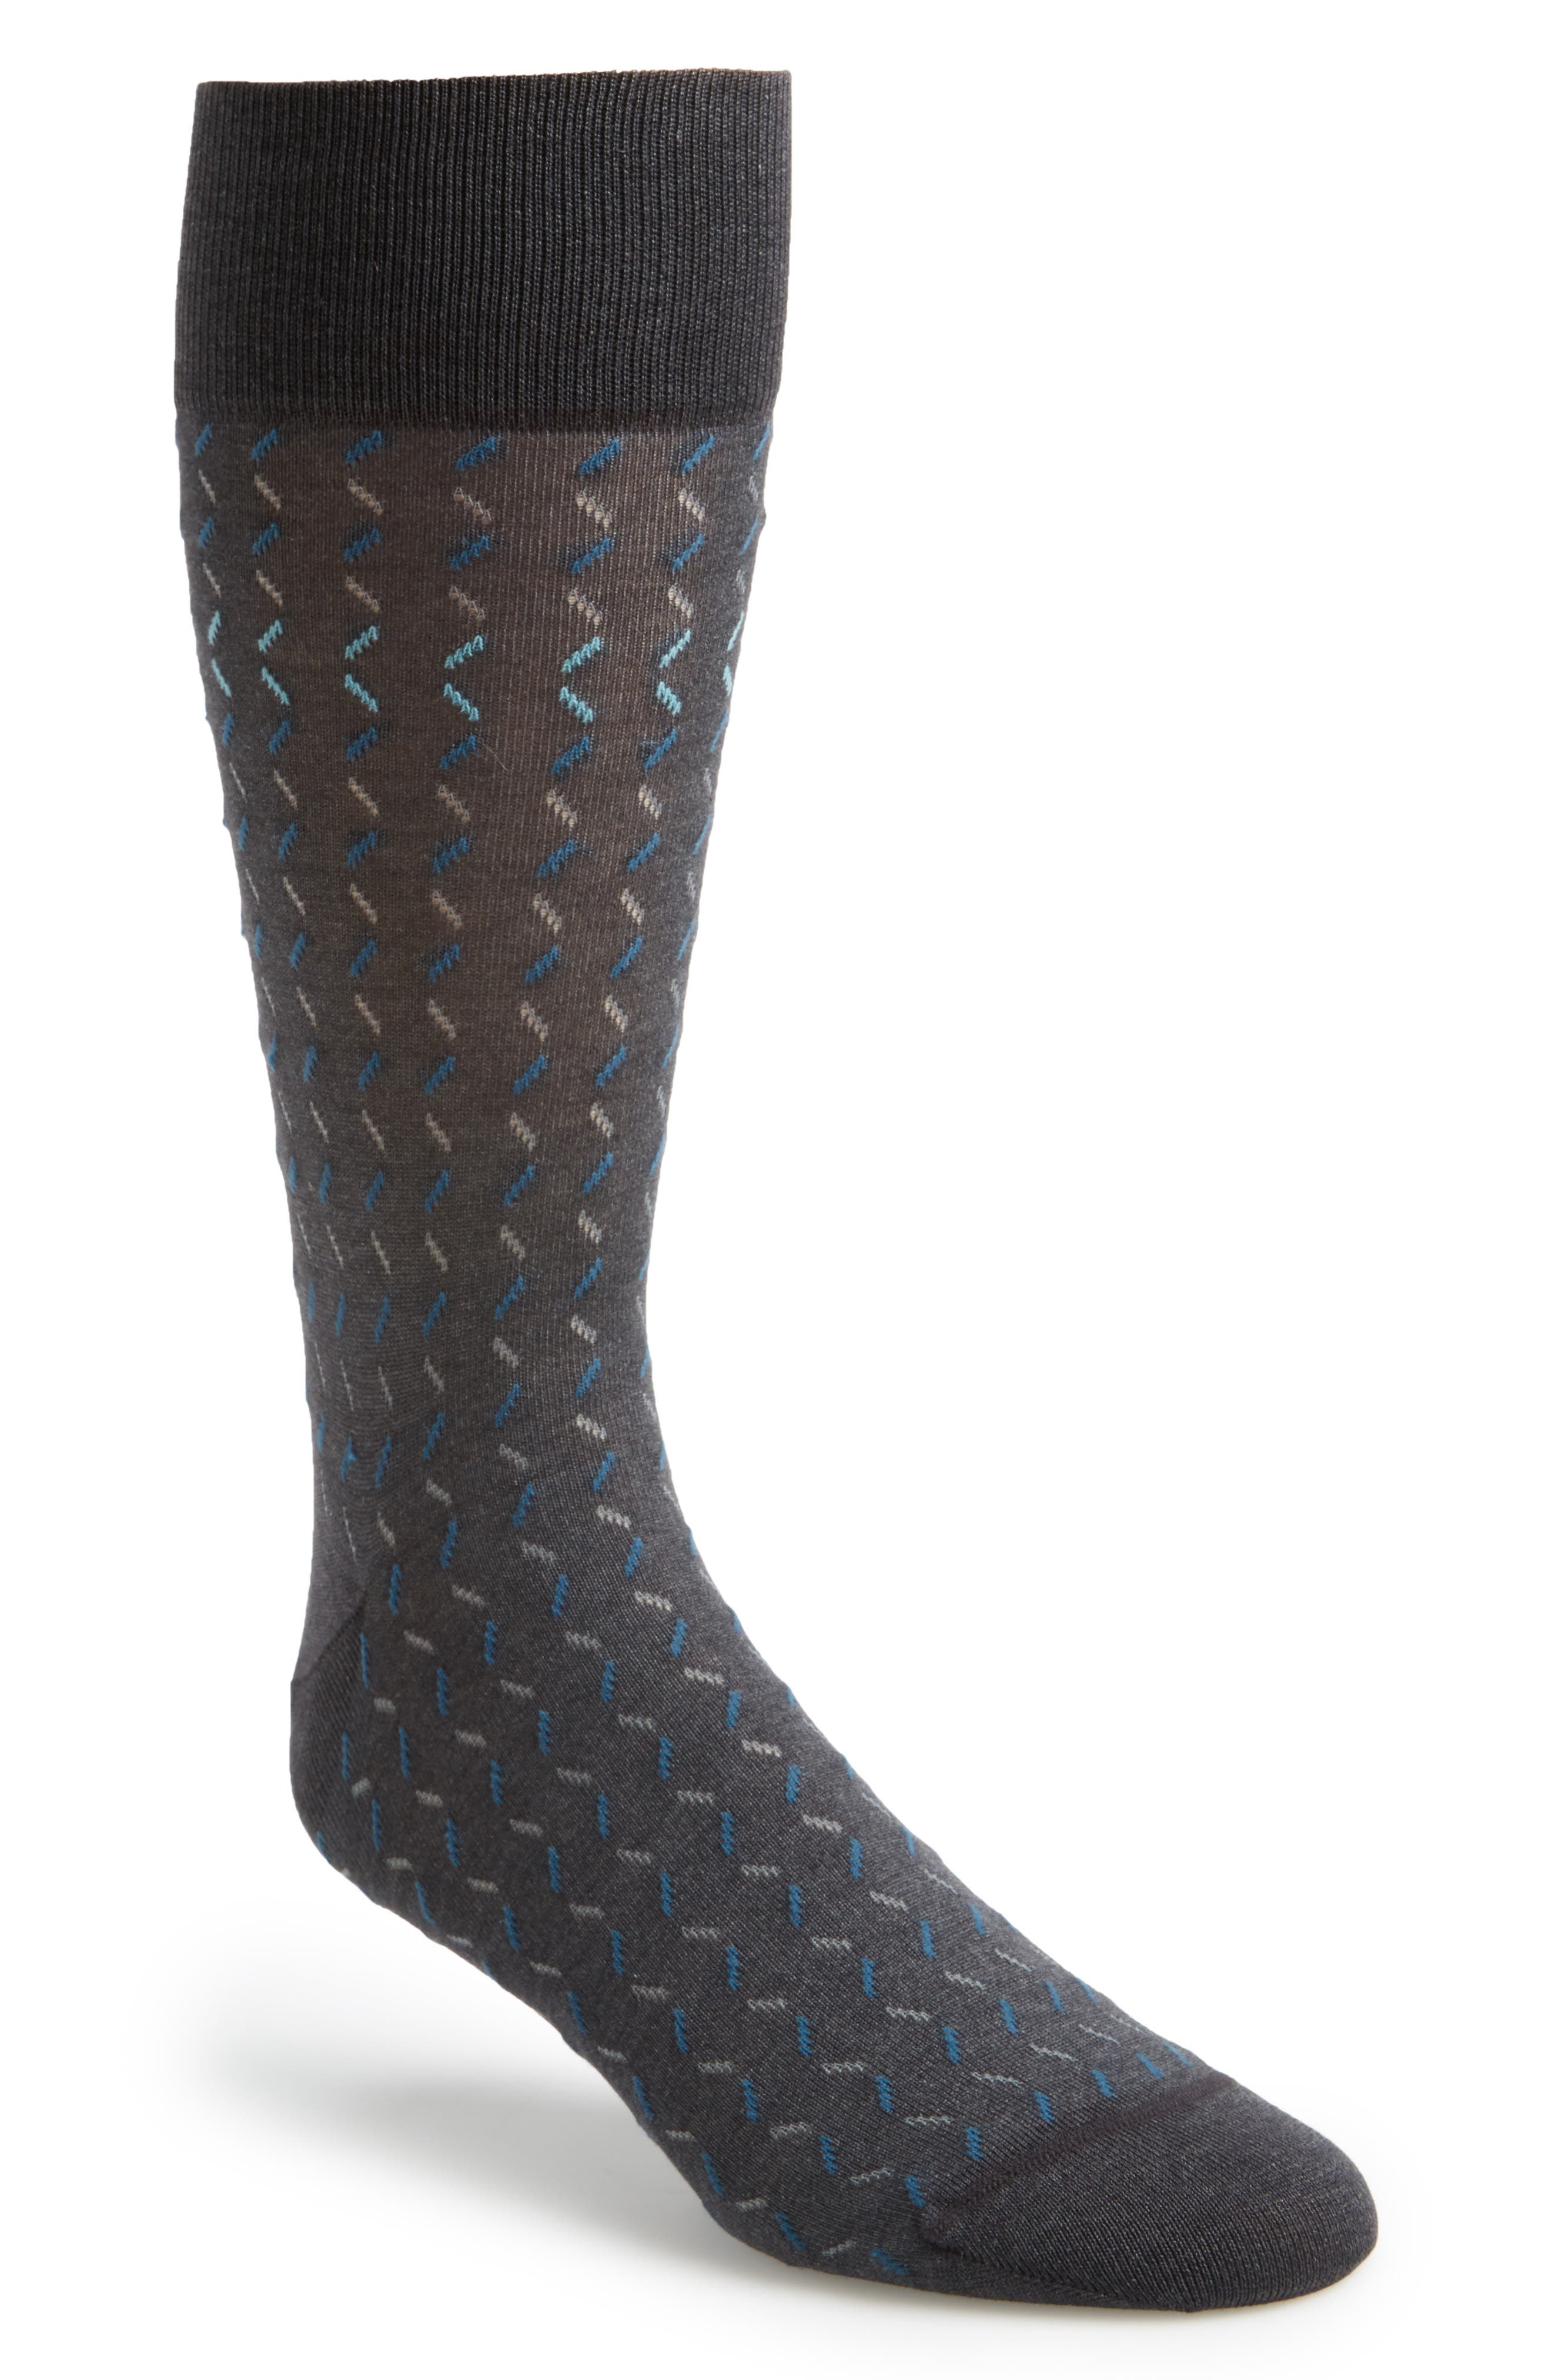 Dash Socks,                             Main thumbnail 1, color,                             Charcoal/ Teal